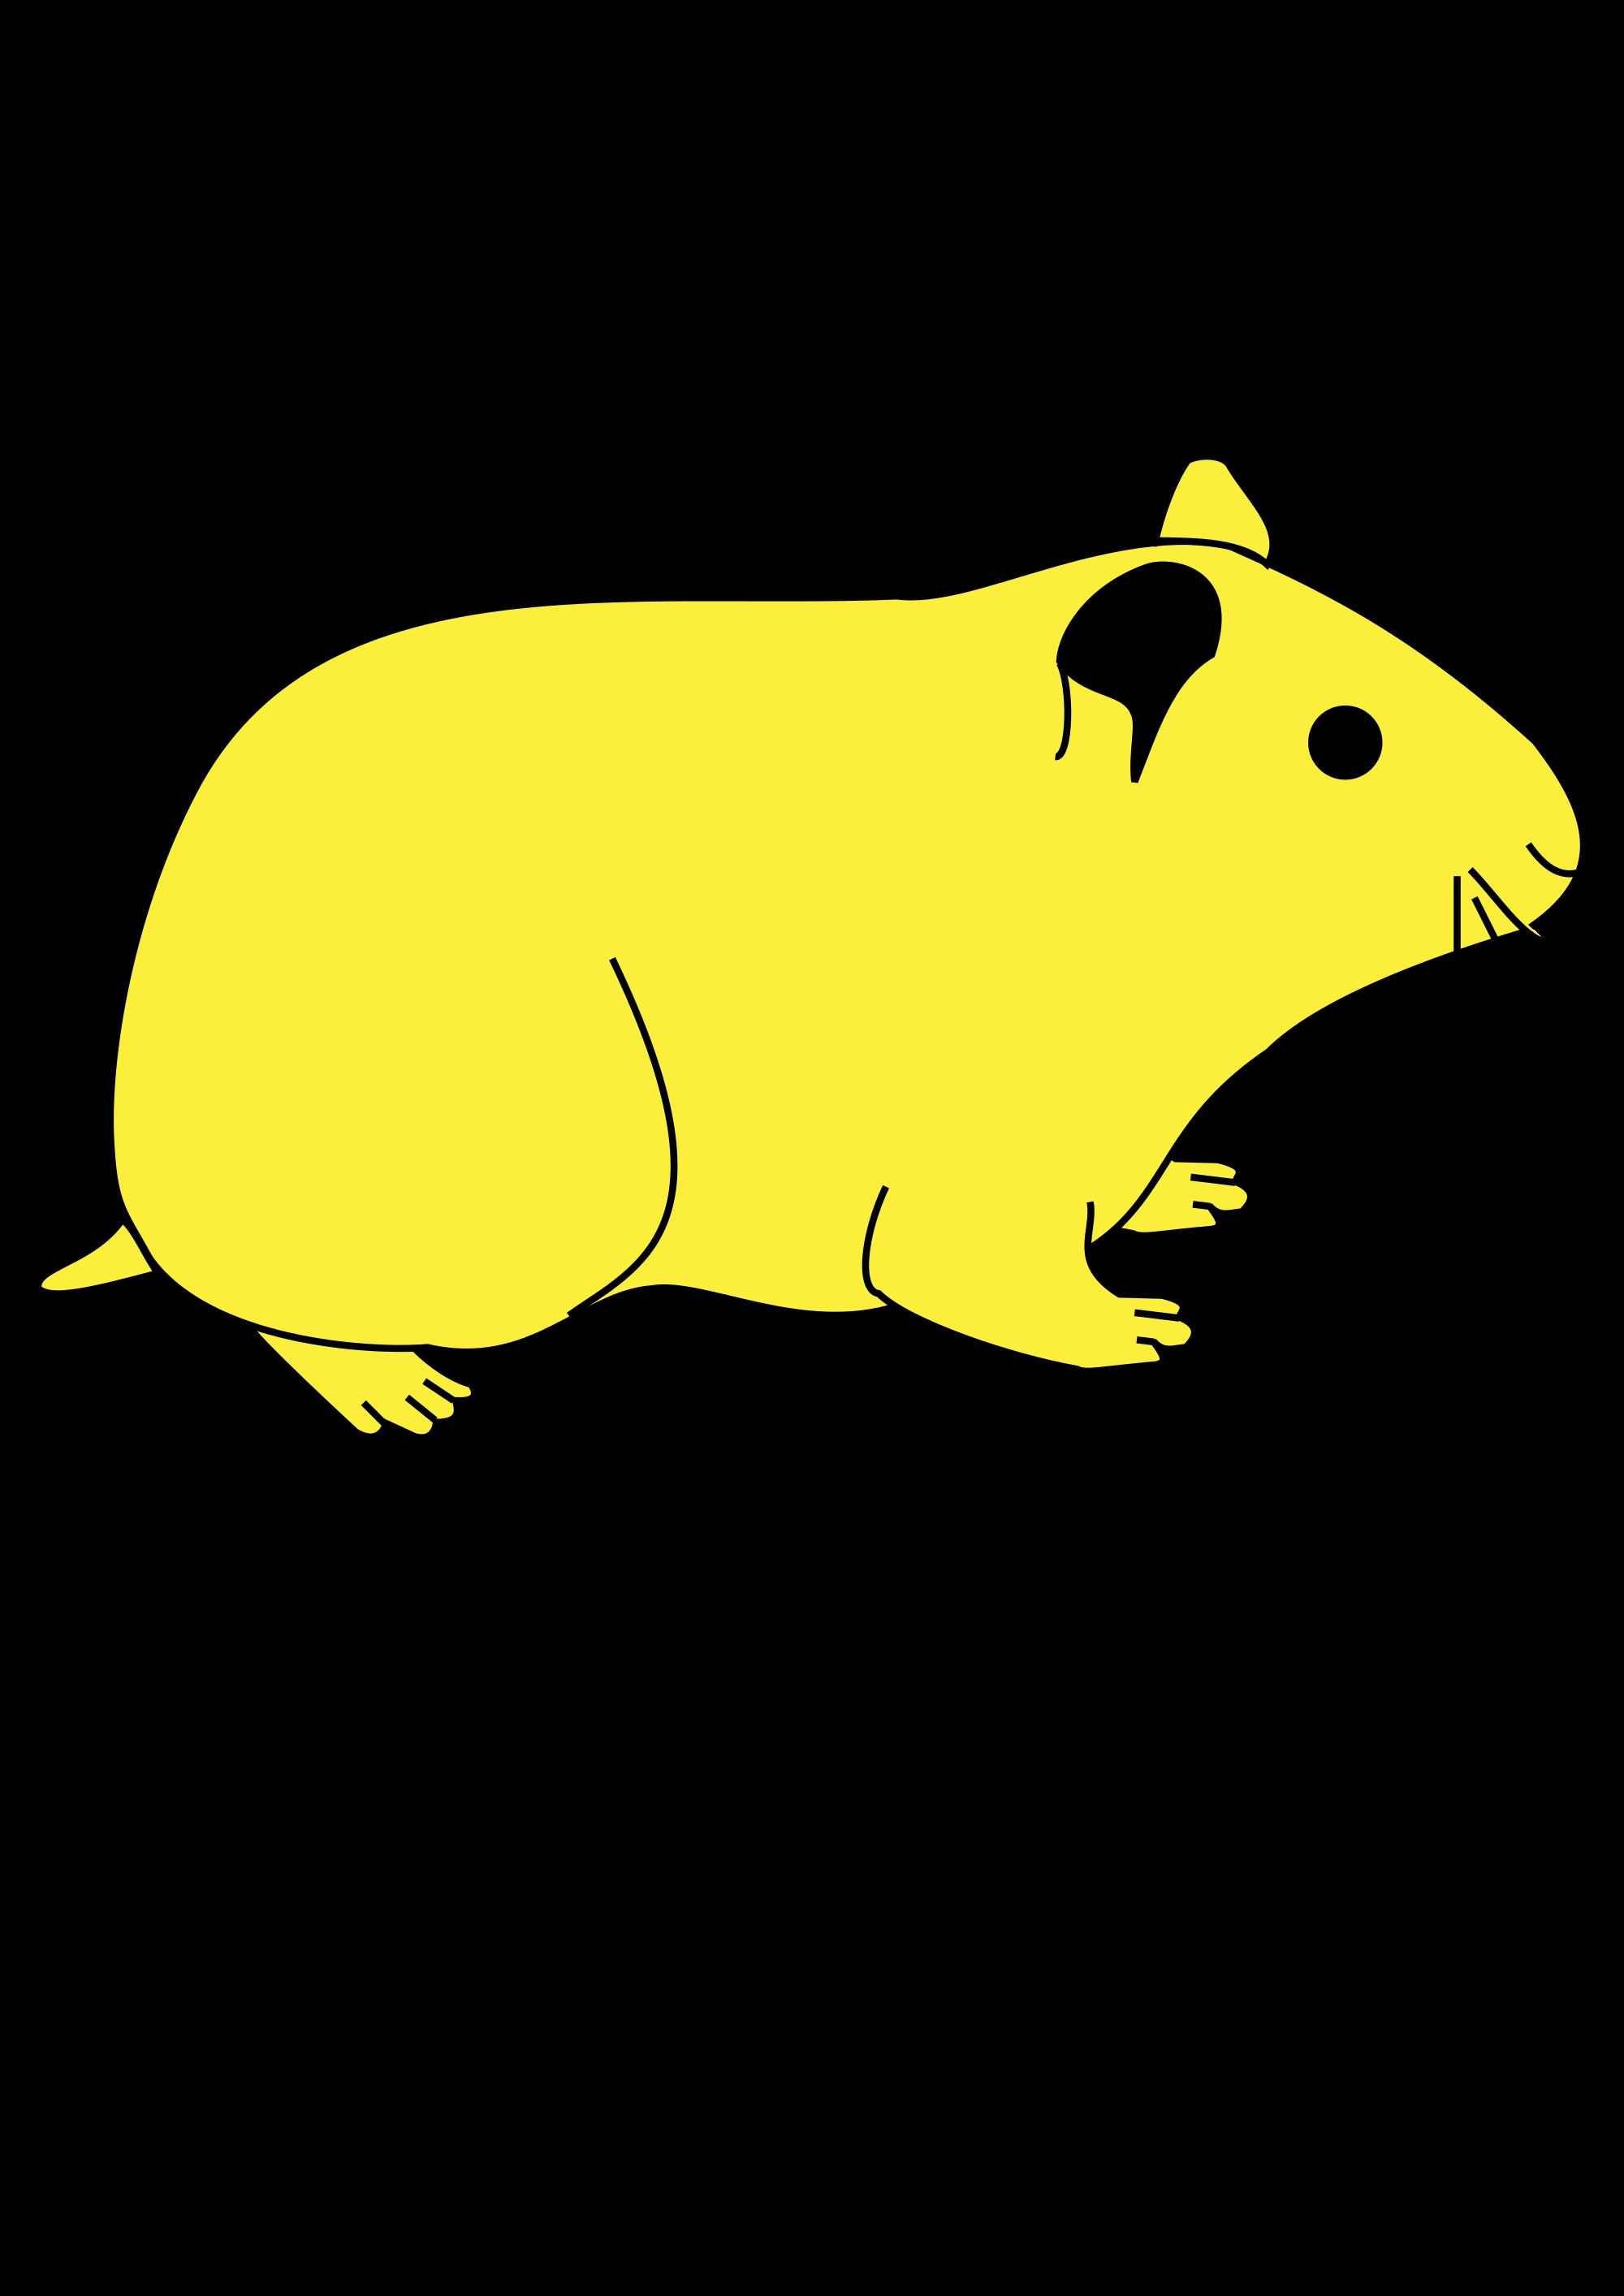 Hamster svg #10, Download drawings